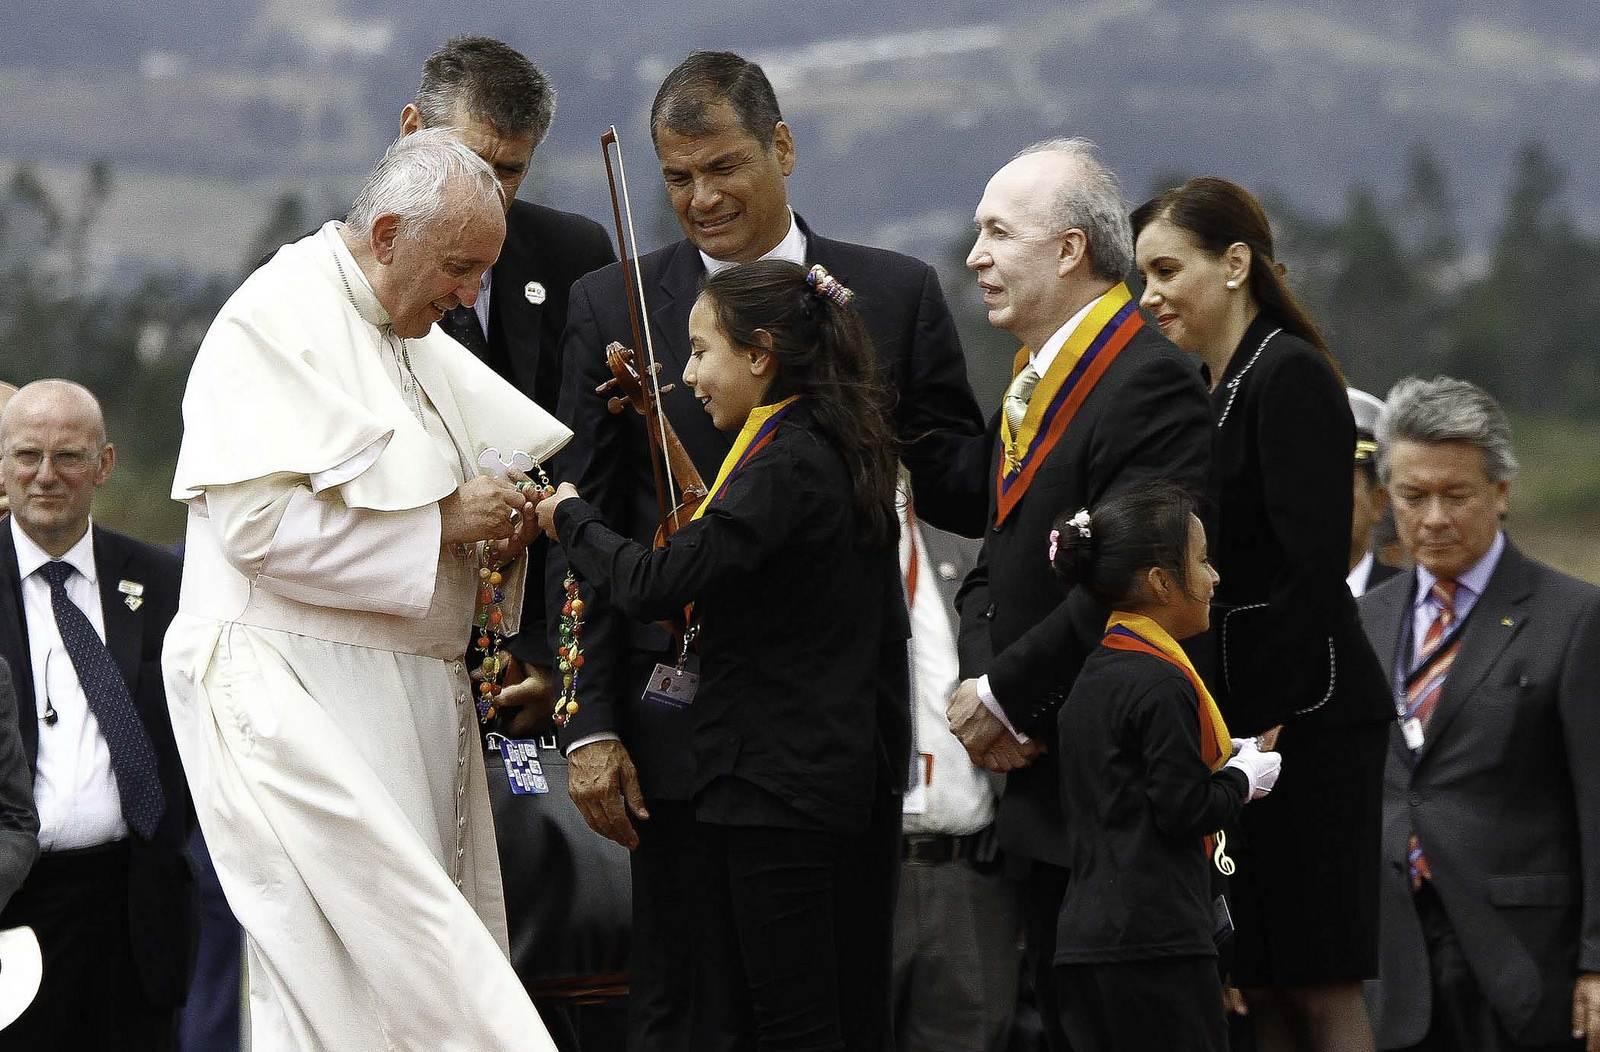 pope francis6 Pope Francis leaving Ecuador